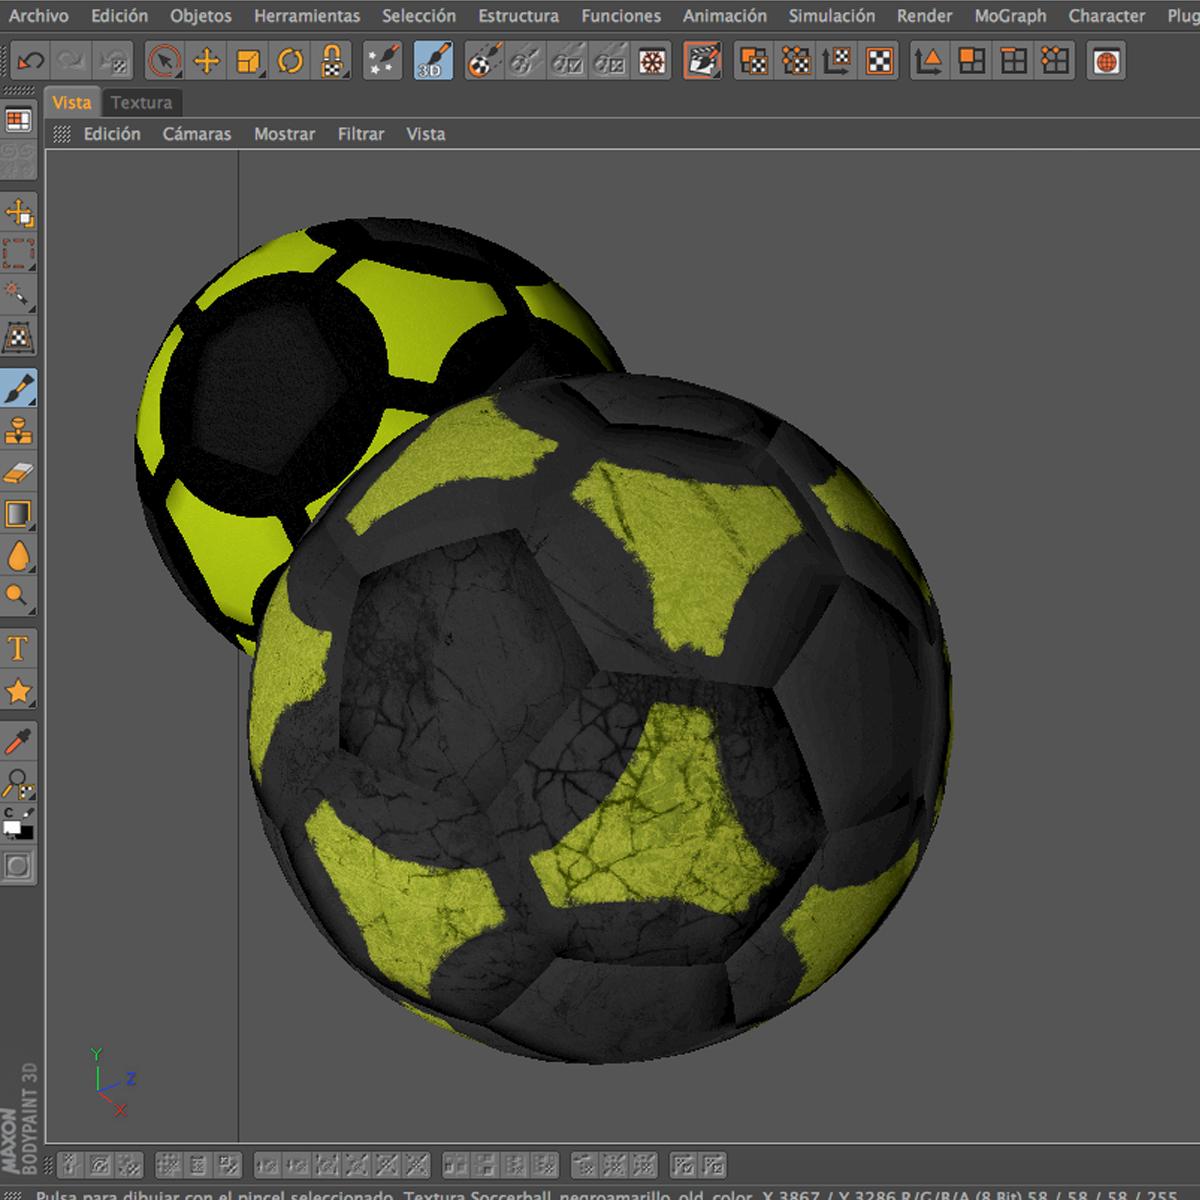 soccerball black yellow 3d model 3ds max fbx c4d ma mb obj 204215